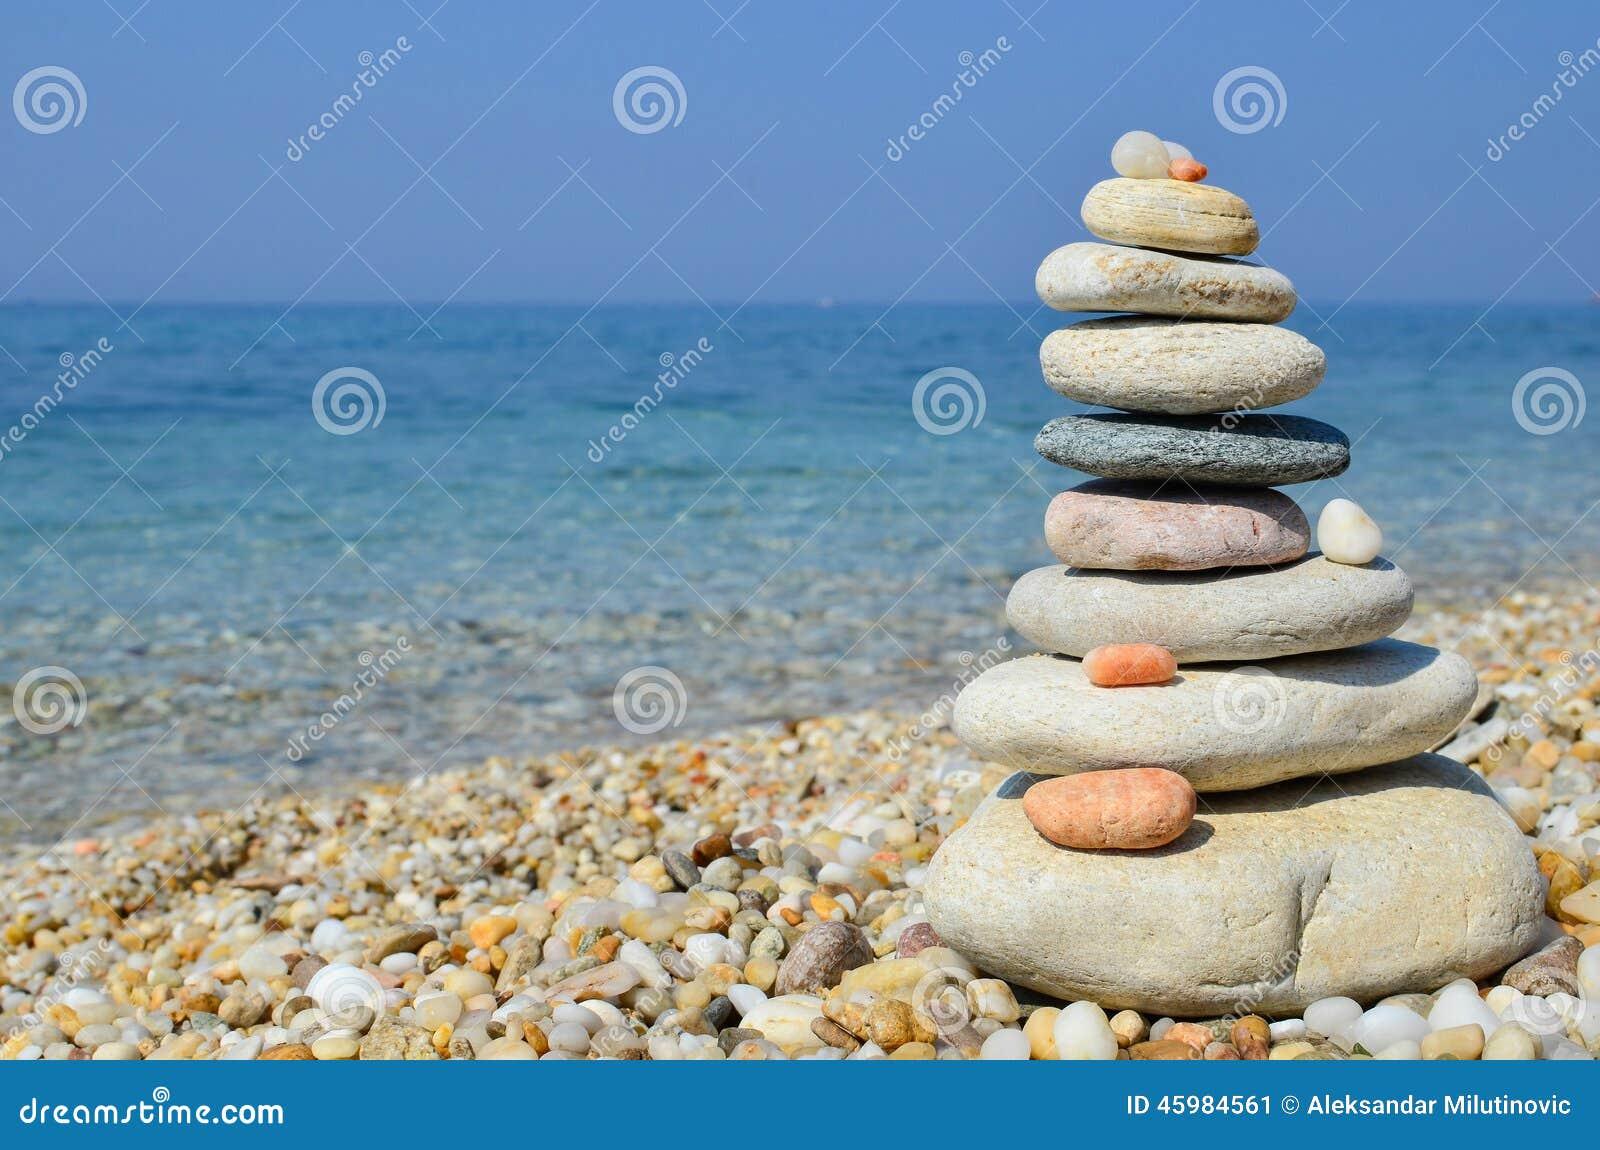 Zen stones on a beach